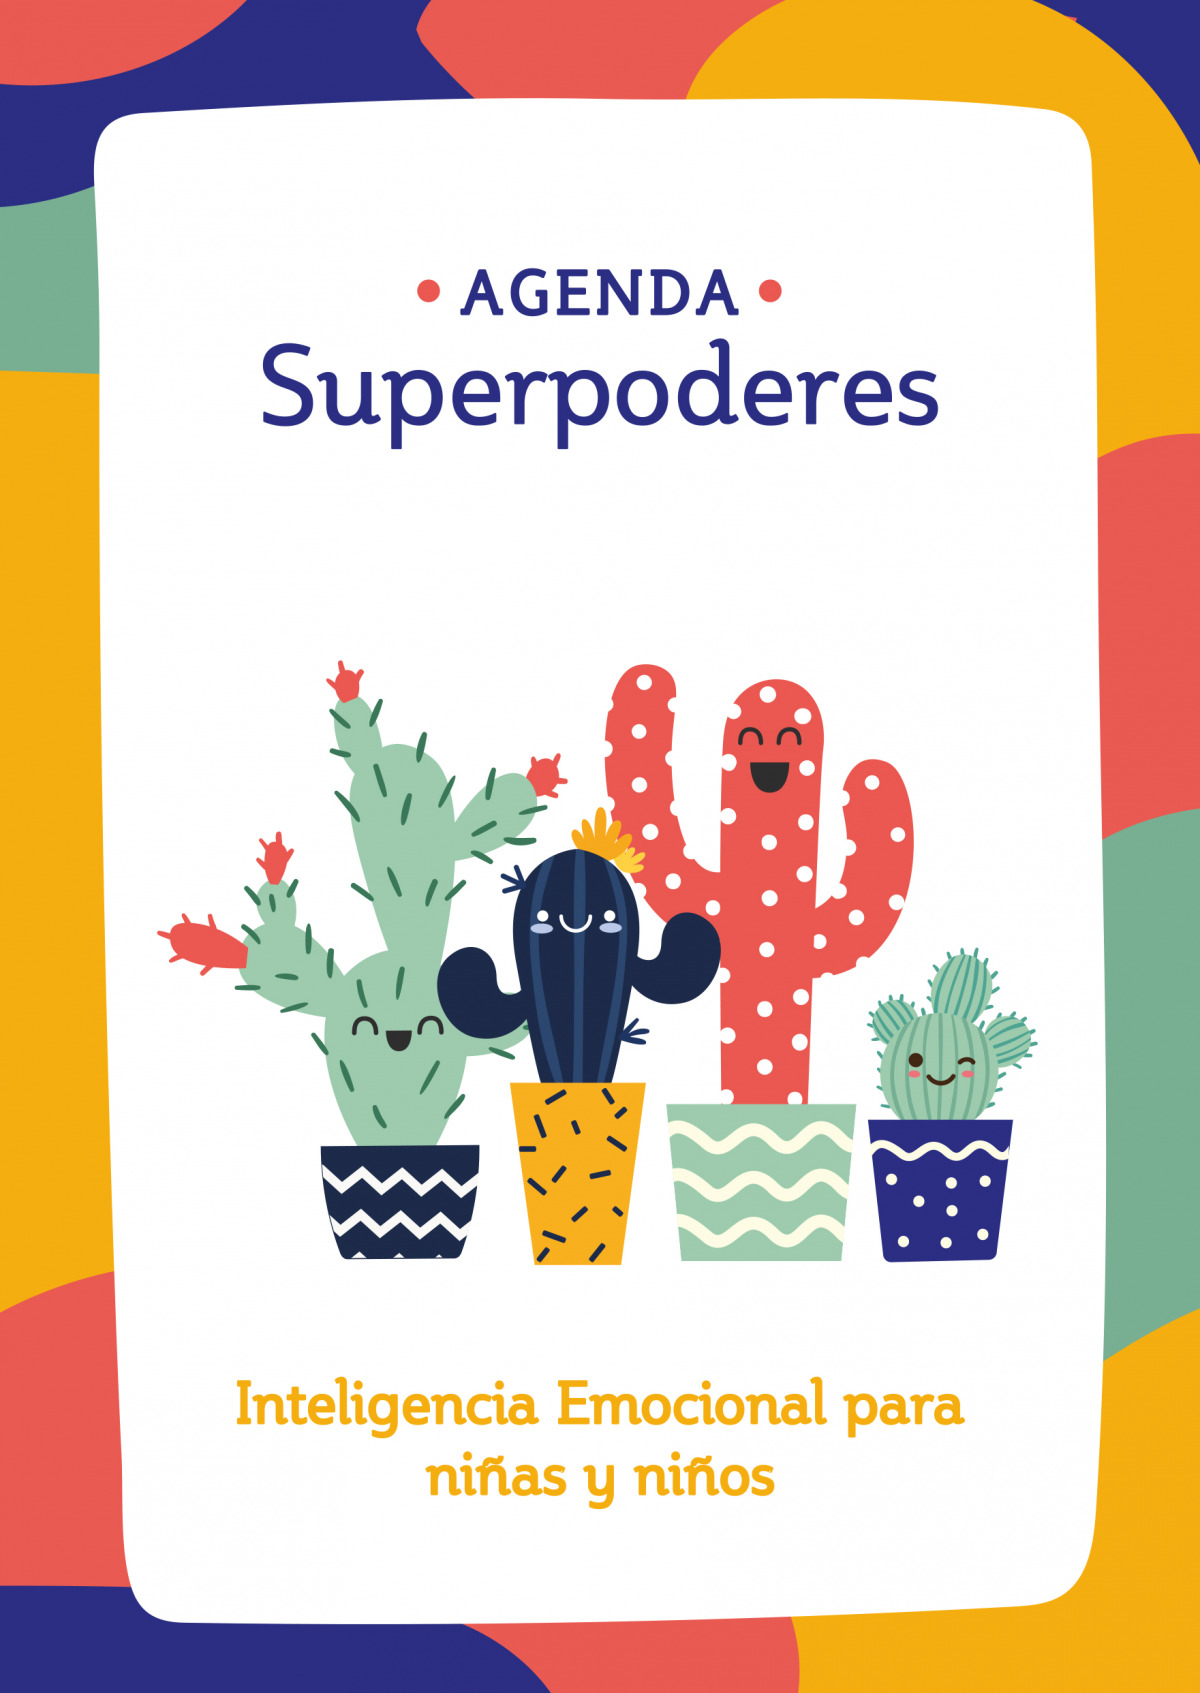 Agenda Superpoderes